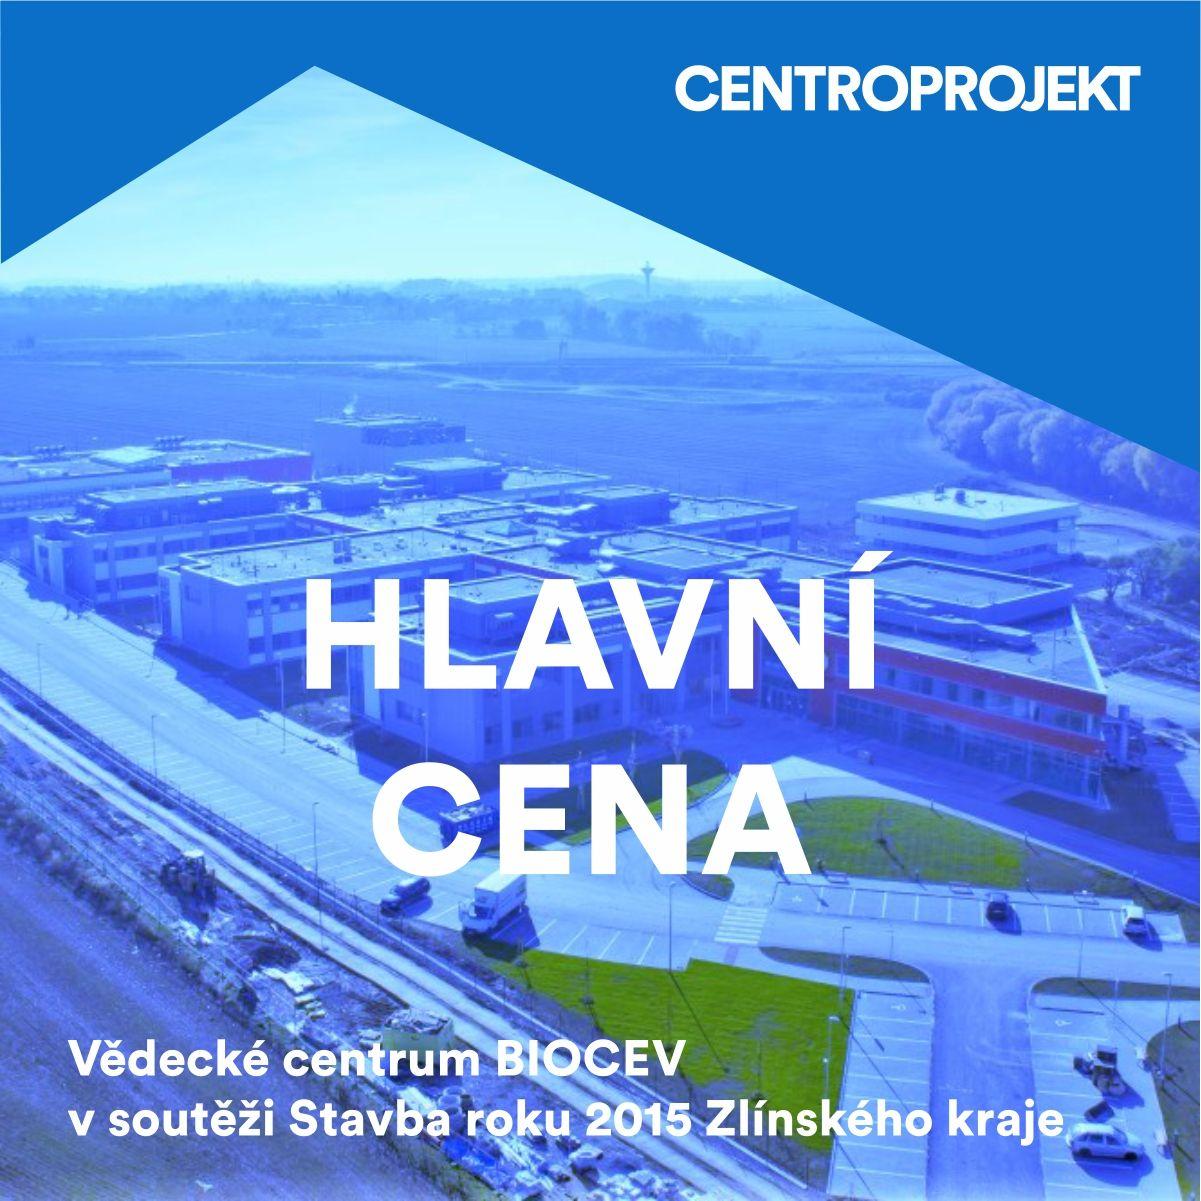 01_stavba-roku-zlinskeho-kraje_centroprojekt